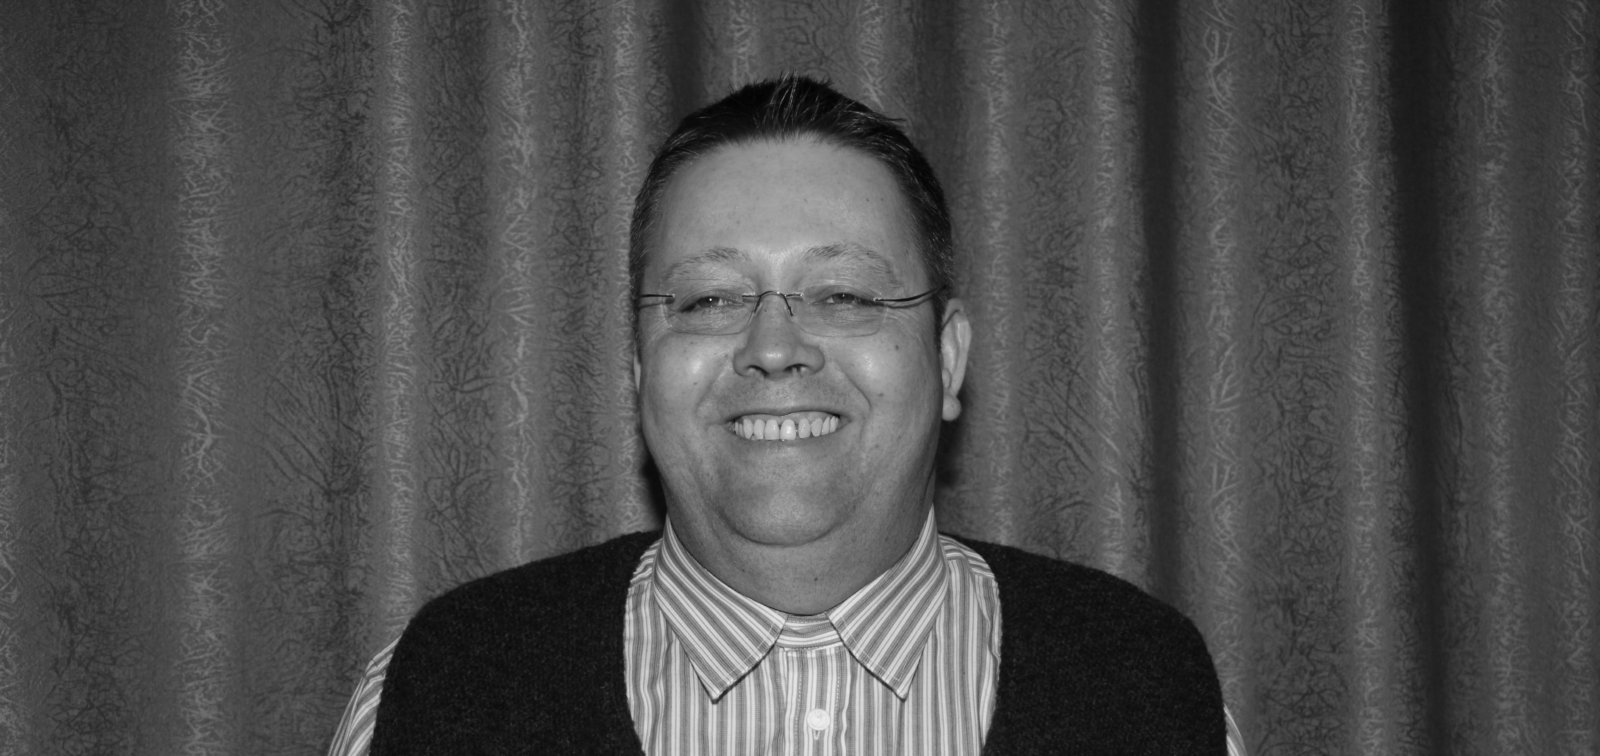 Claus Ziegler